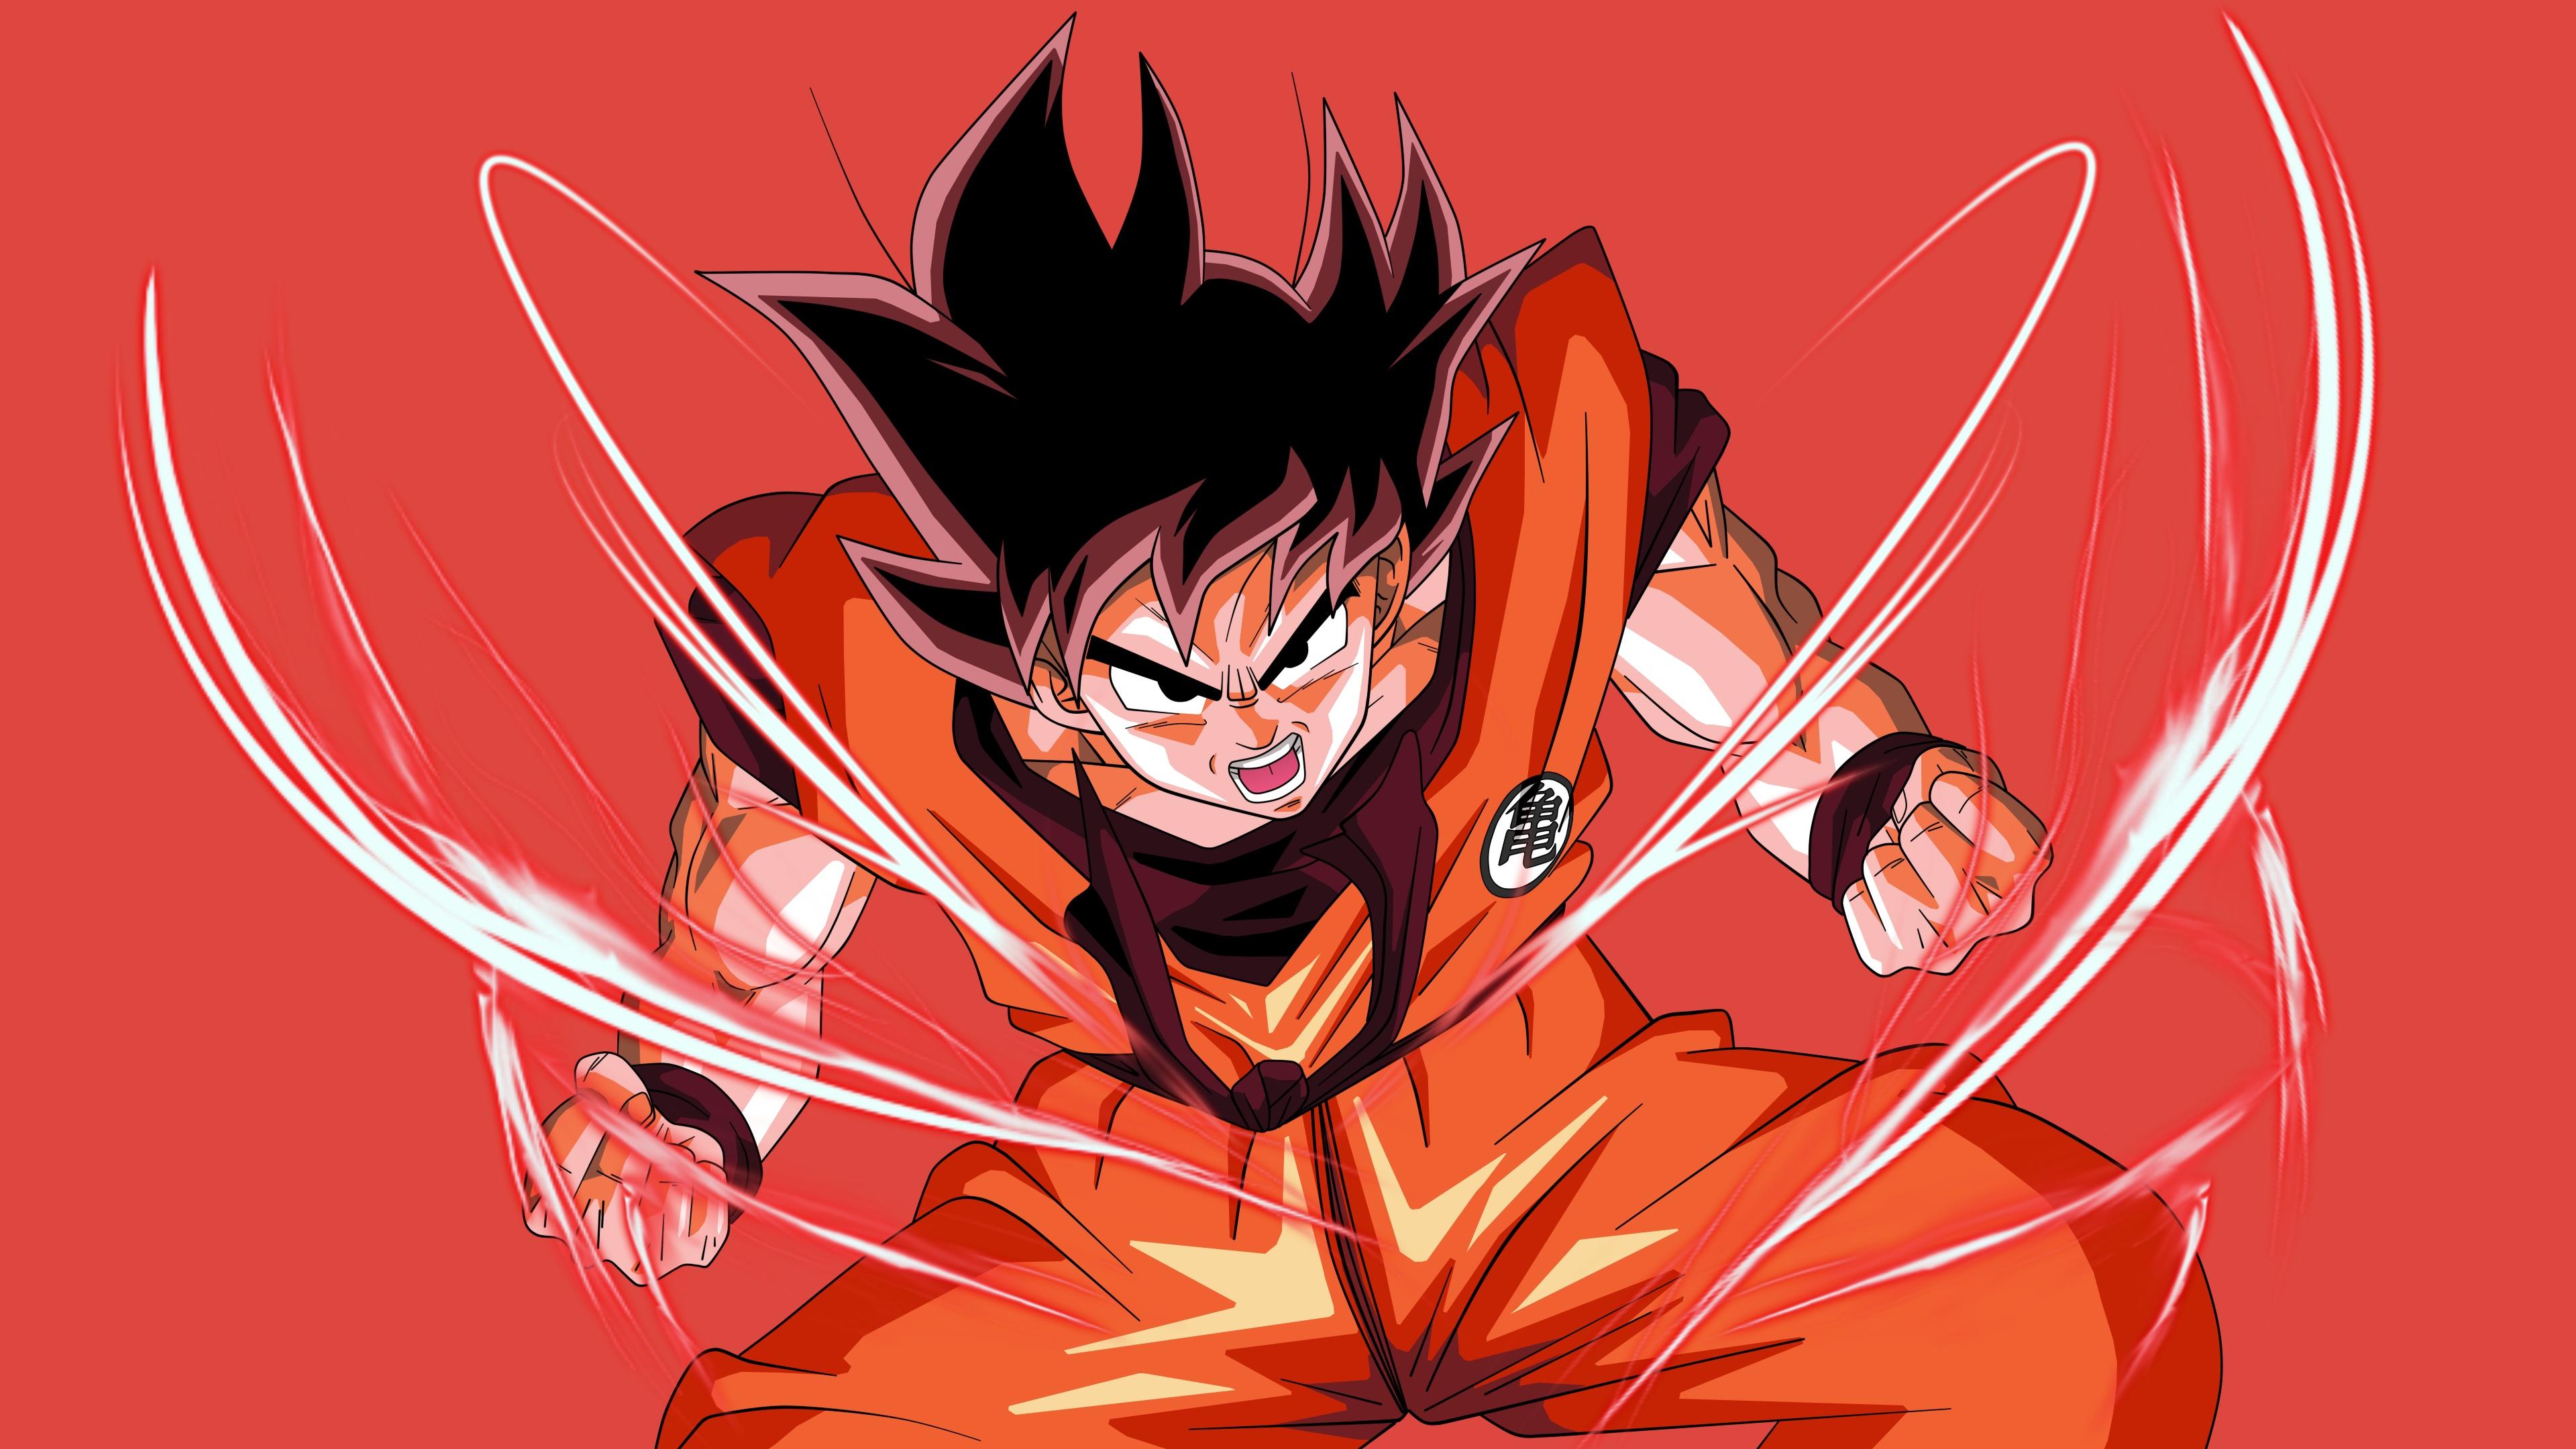 Goku 1080p wallpaper